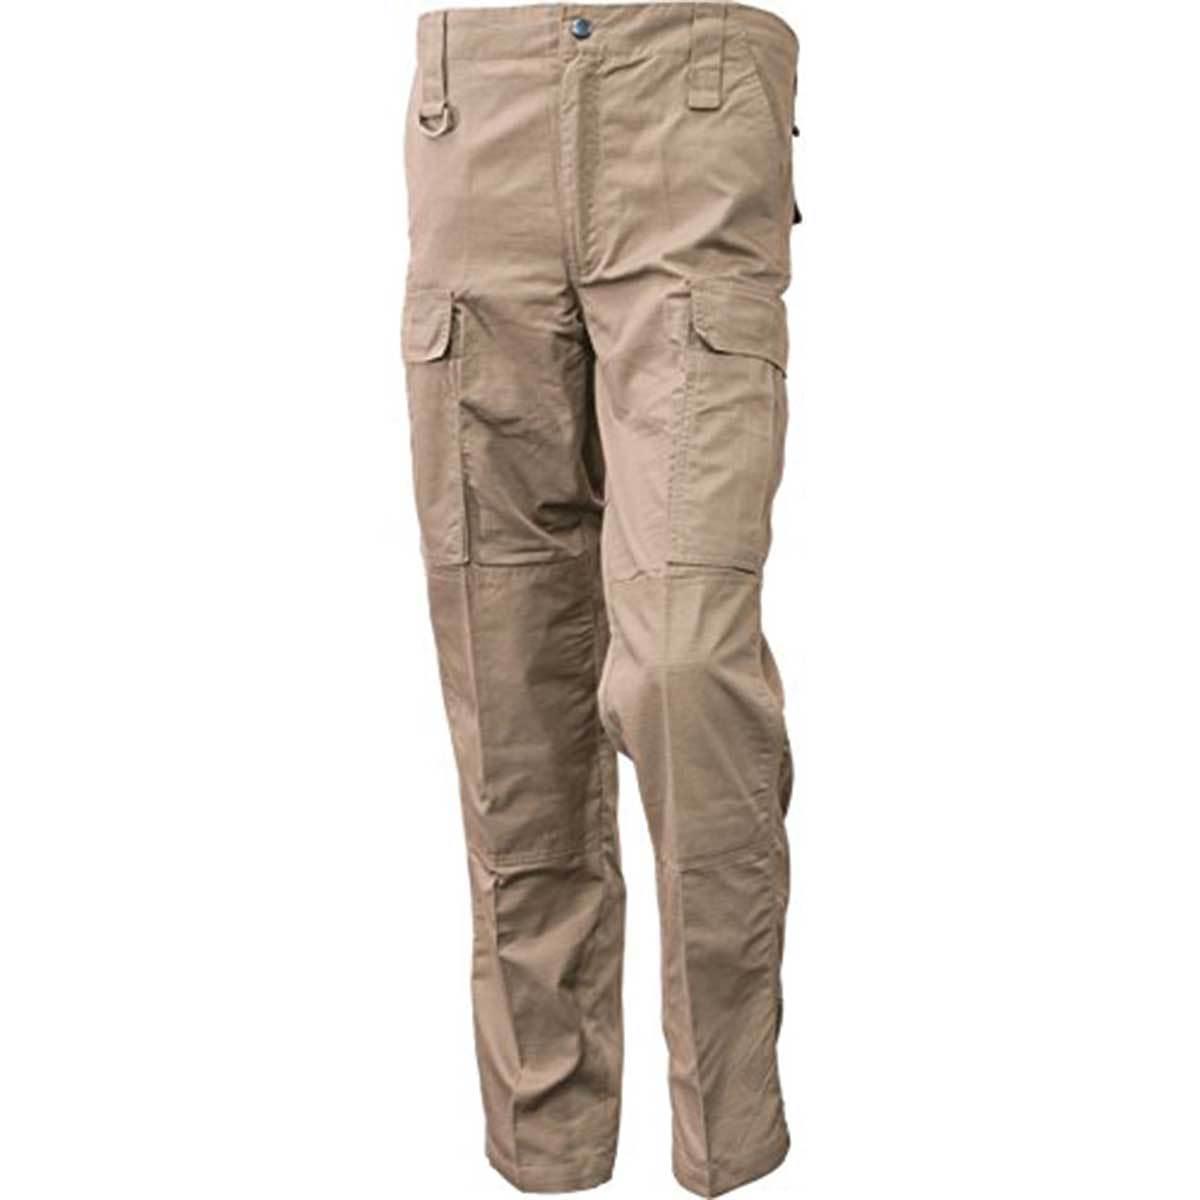 Tippmann Tactical TDU Pants  Tan  Medium